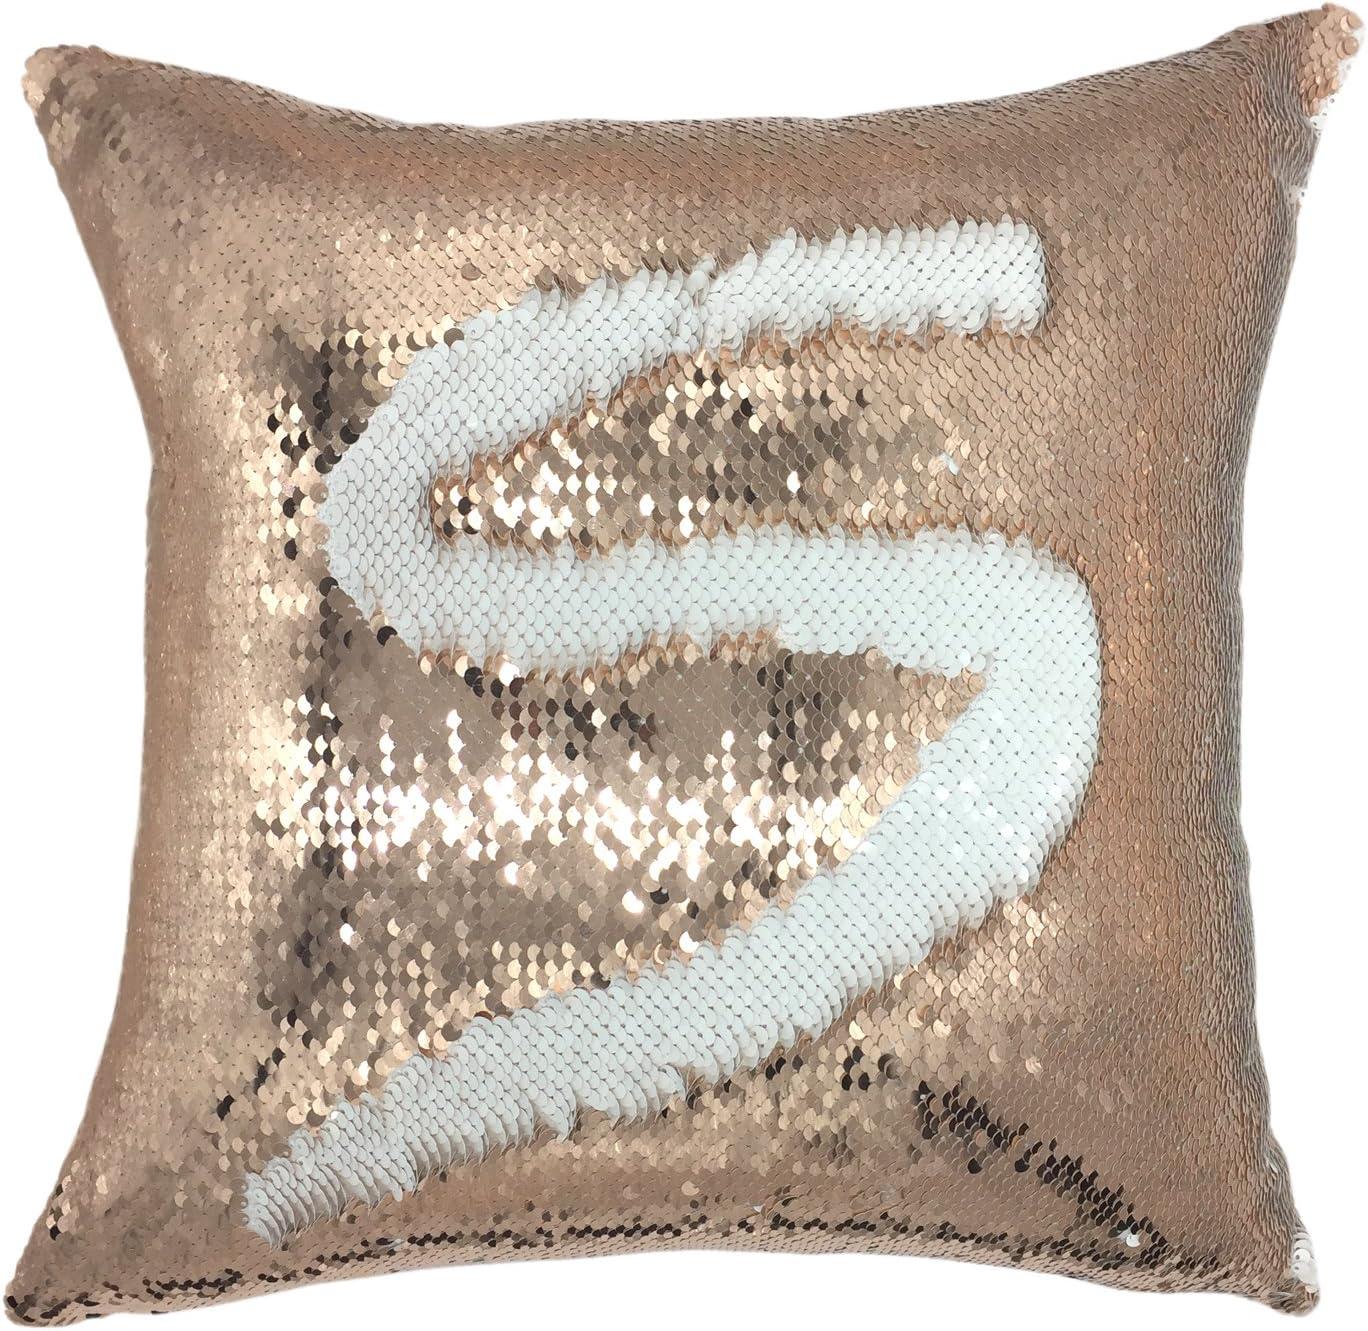 YOUR NEW SMILE Mermaid Throw Pillow Super popular specialty store Magic Case Reversible De Sequins